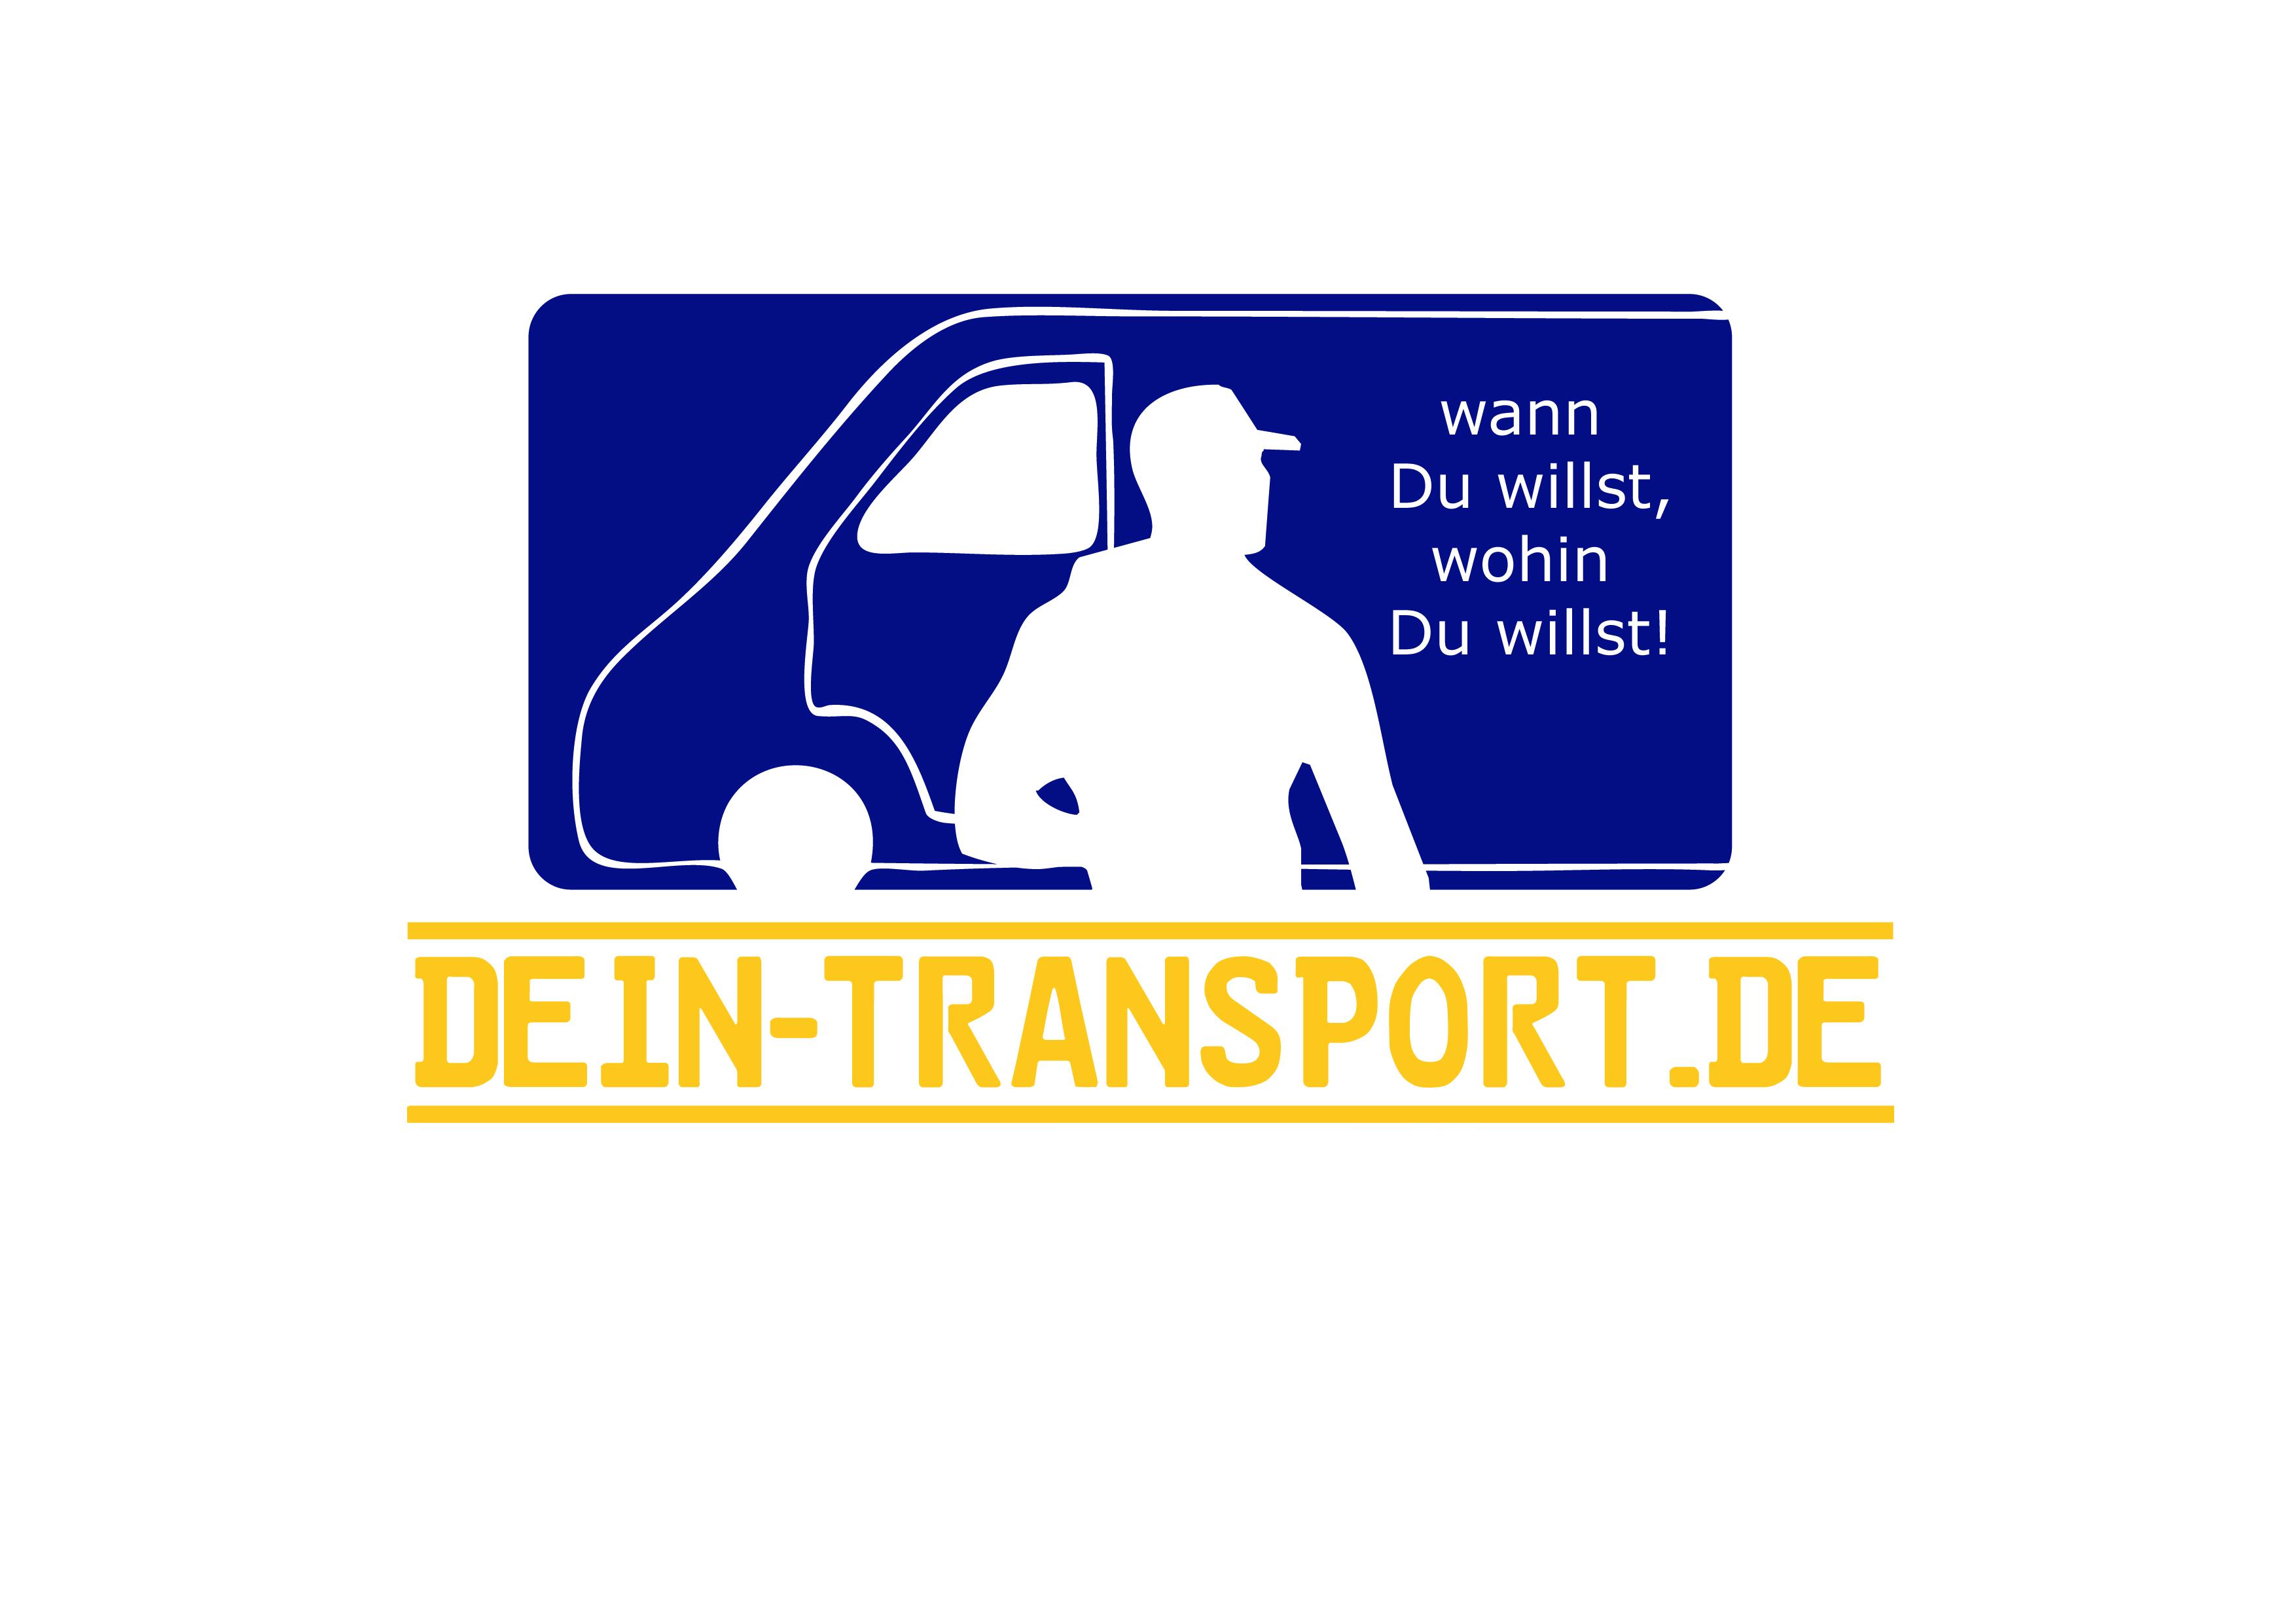 dein-transport.de